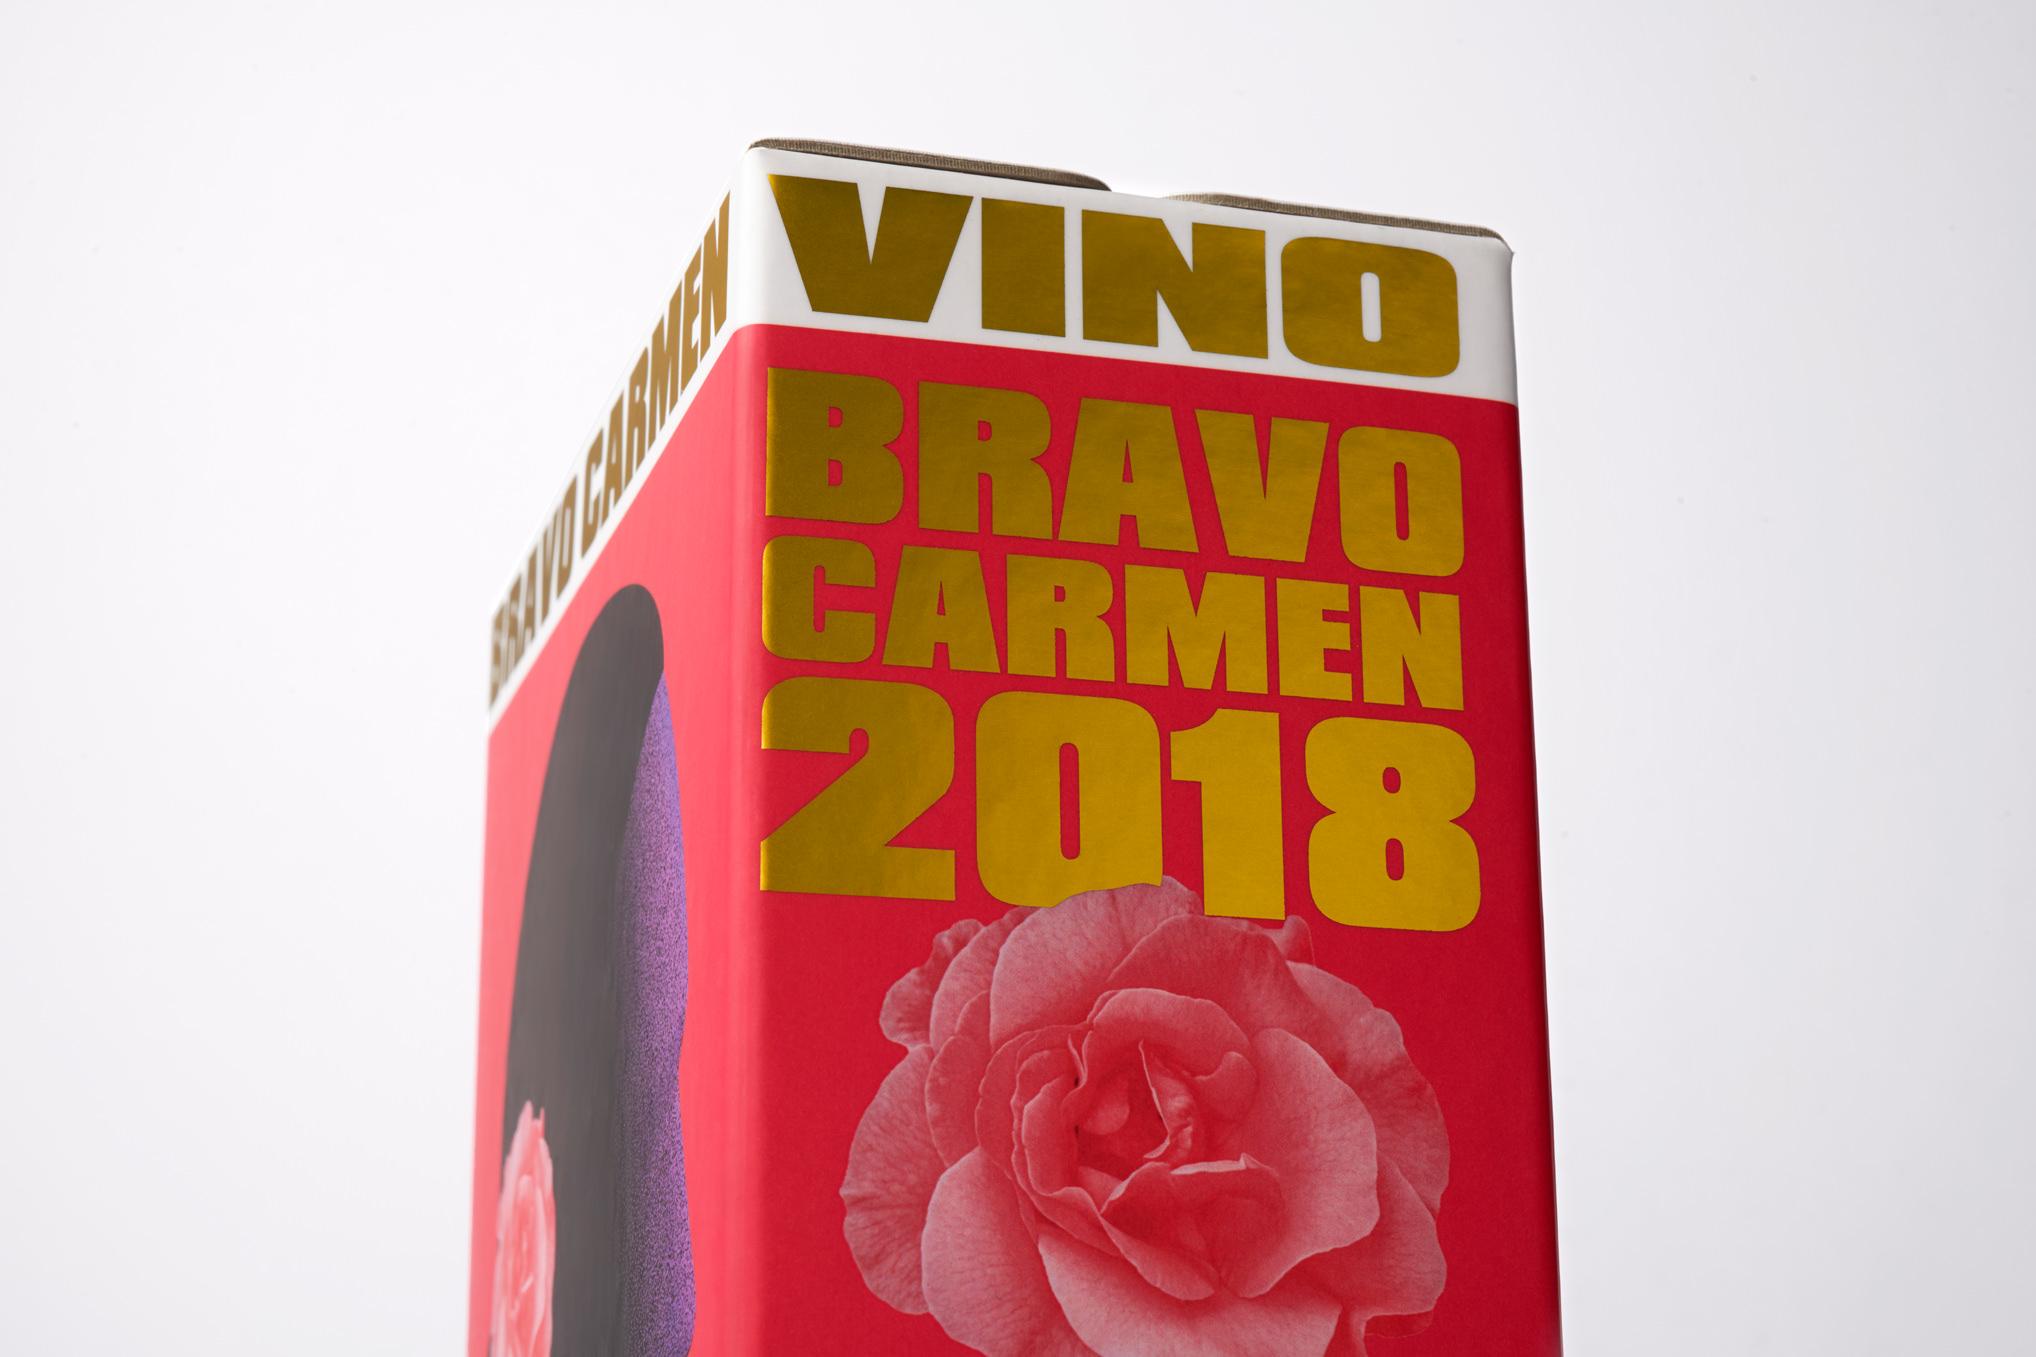 BRAVO CARMEN3